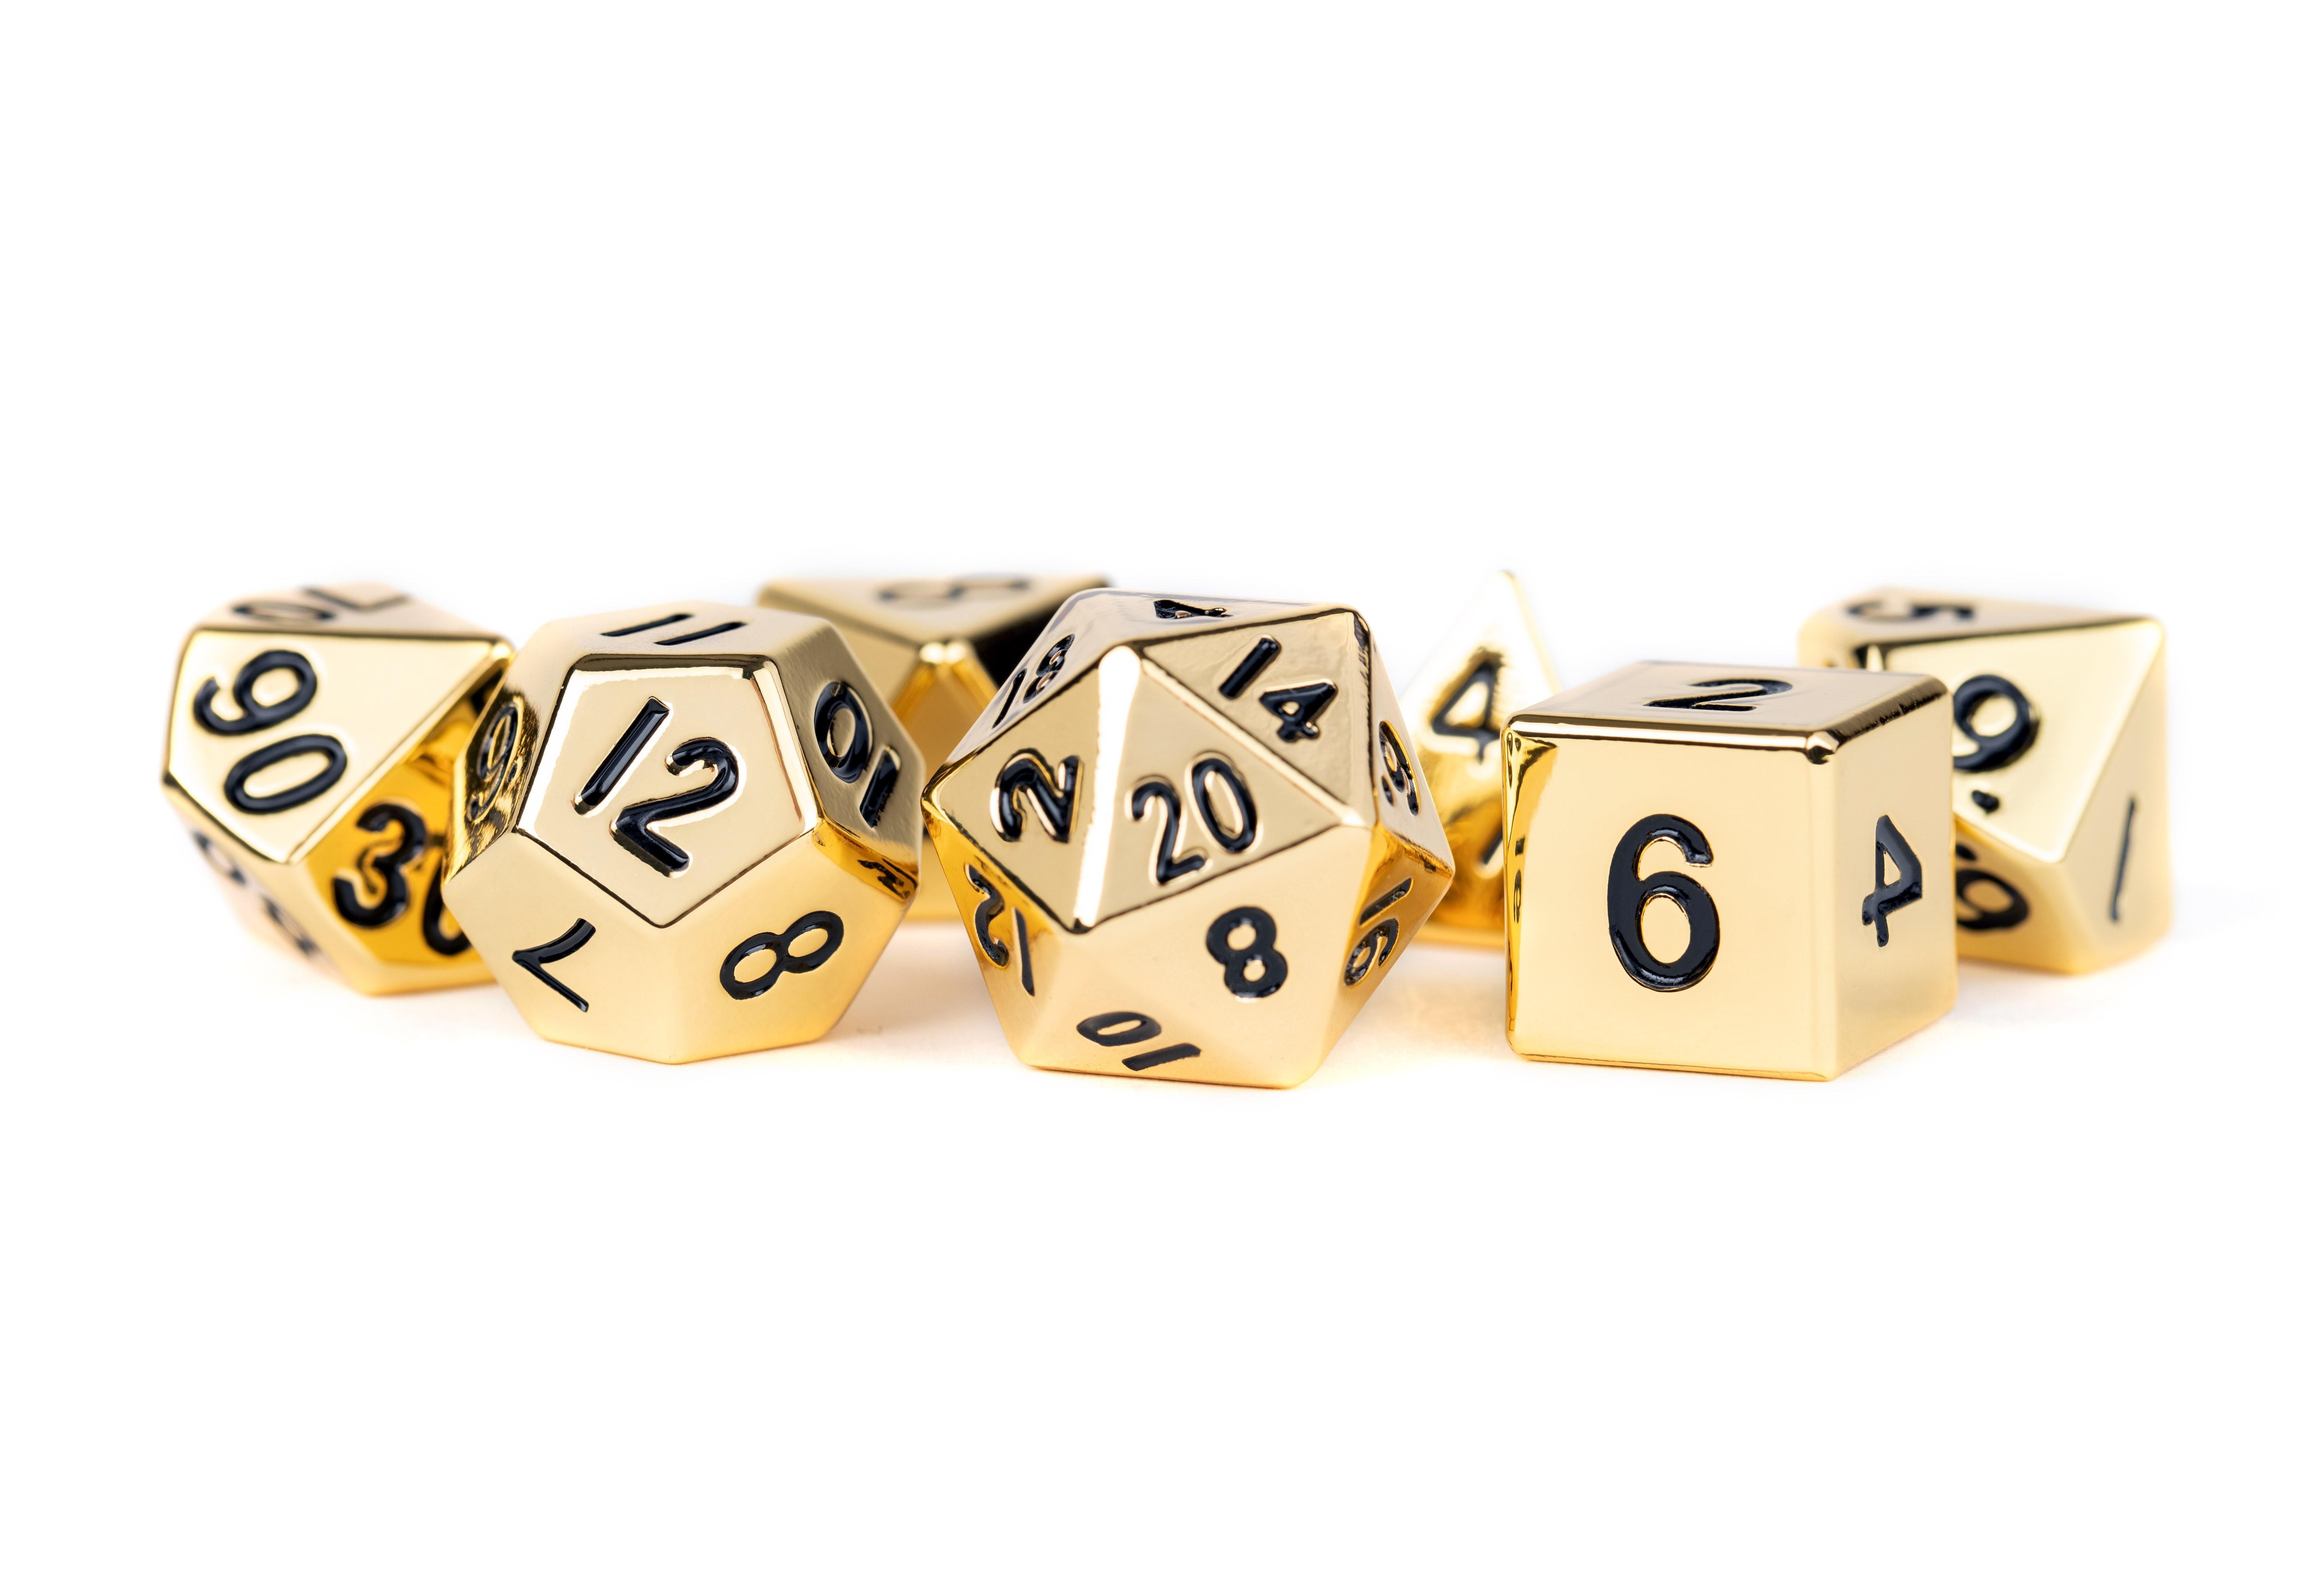 16 mm Polyhedral Metal Dice Set - Gold